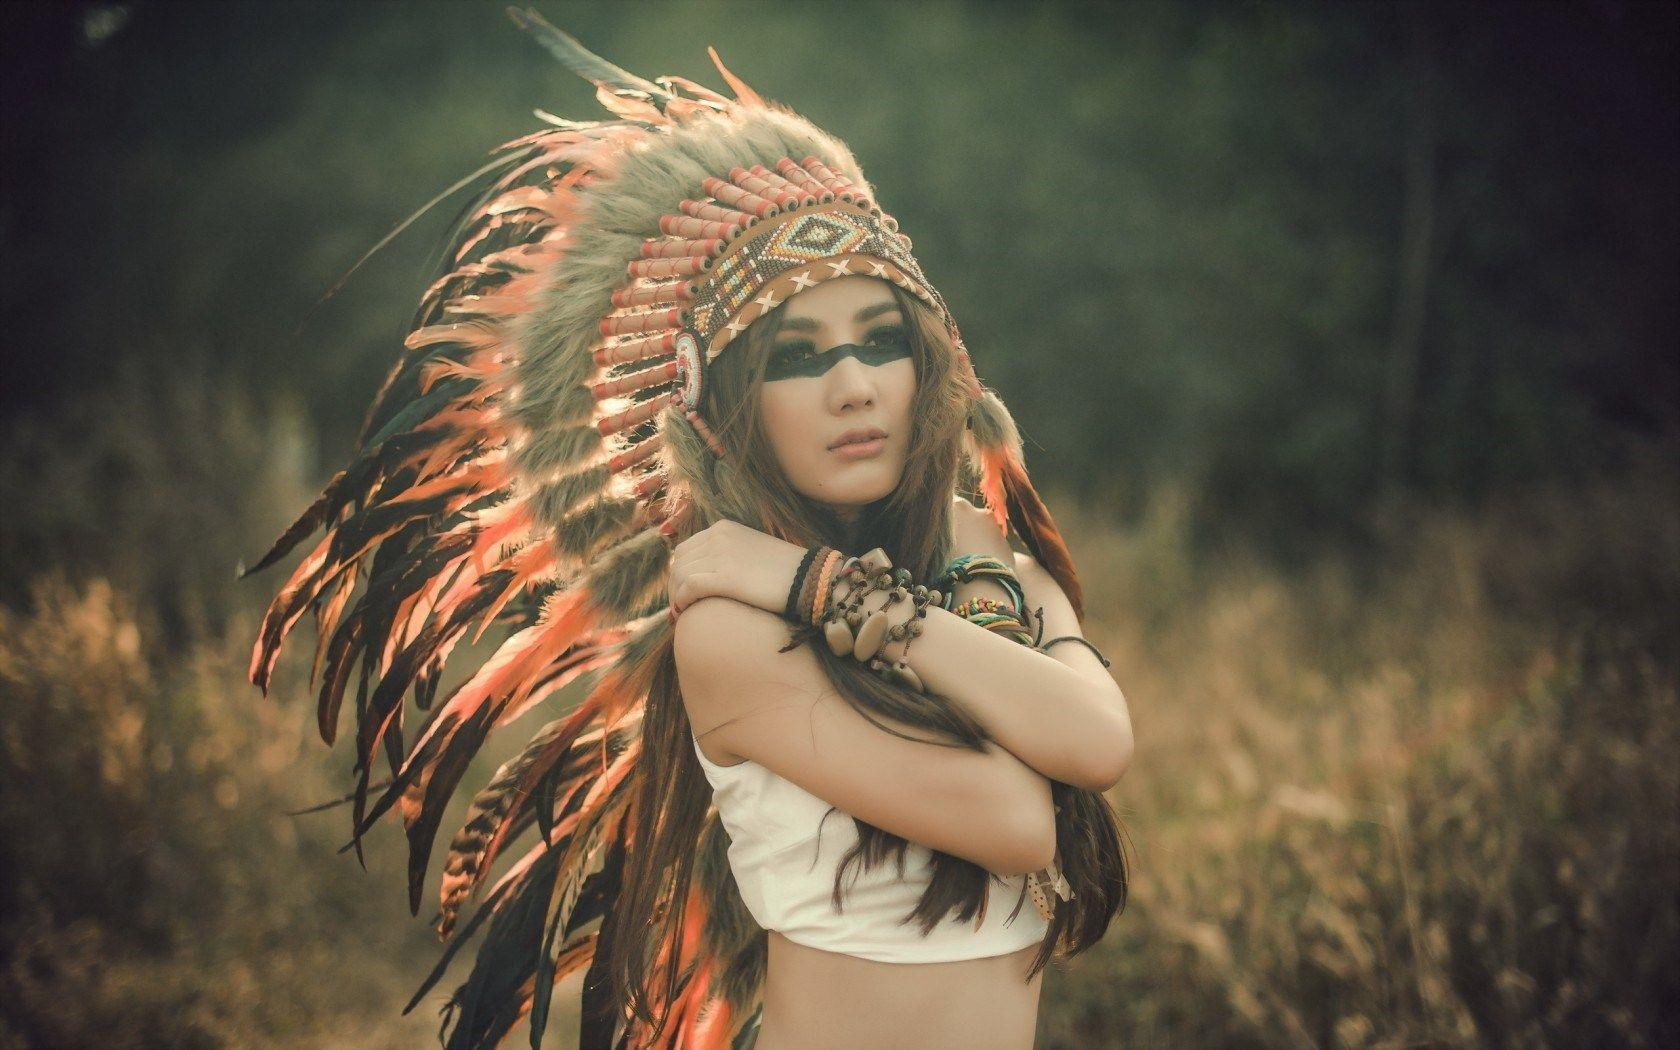 Native American Headdress Girls Wallpapers